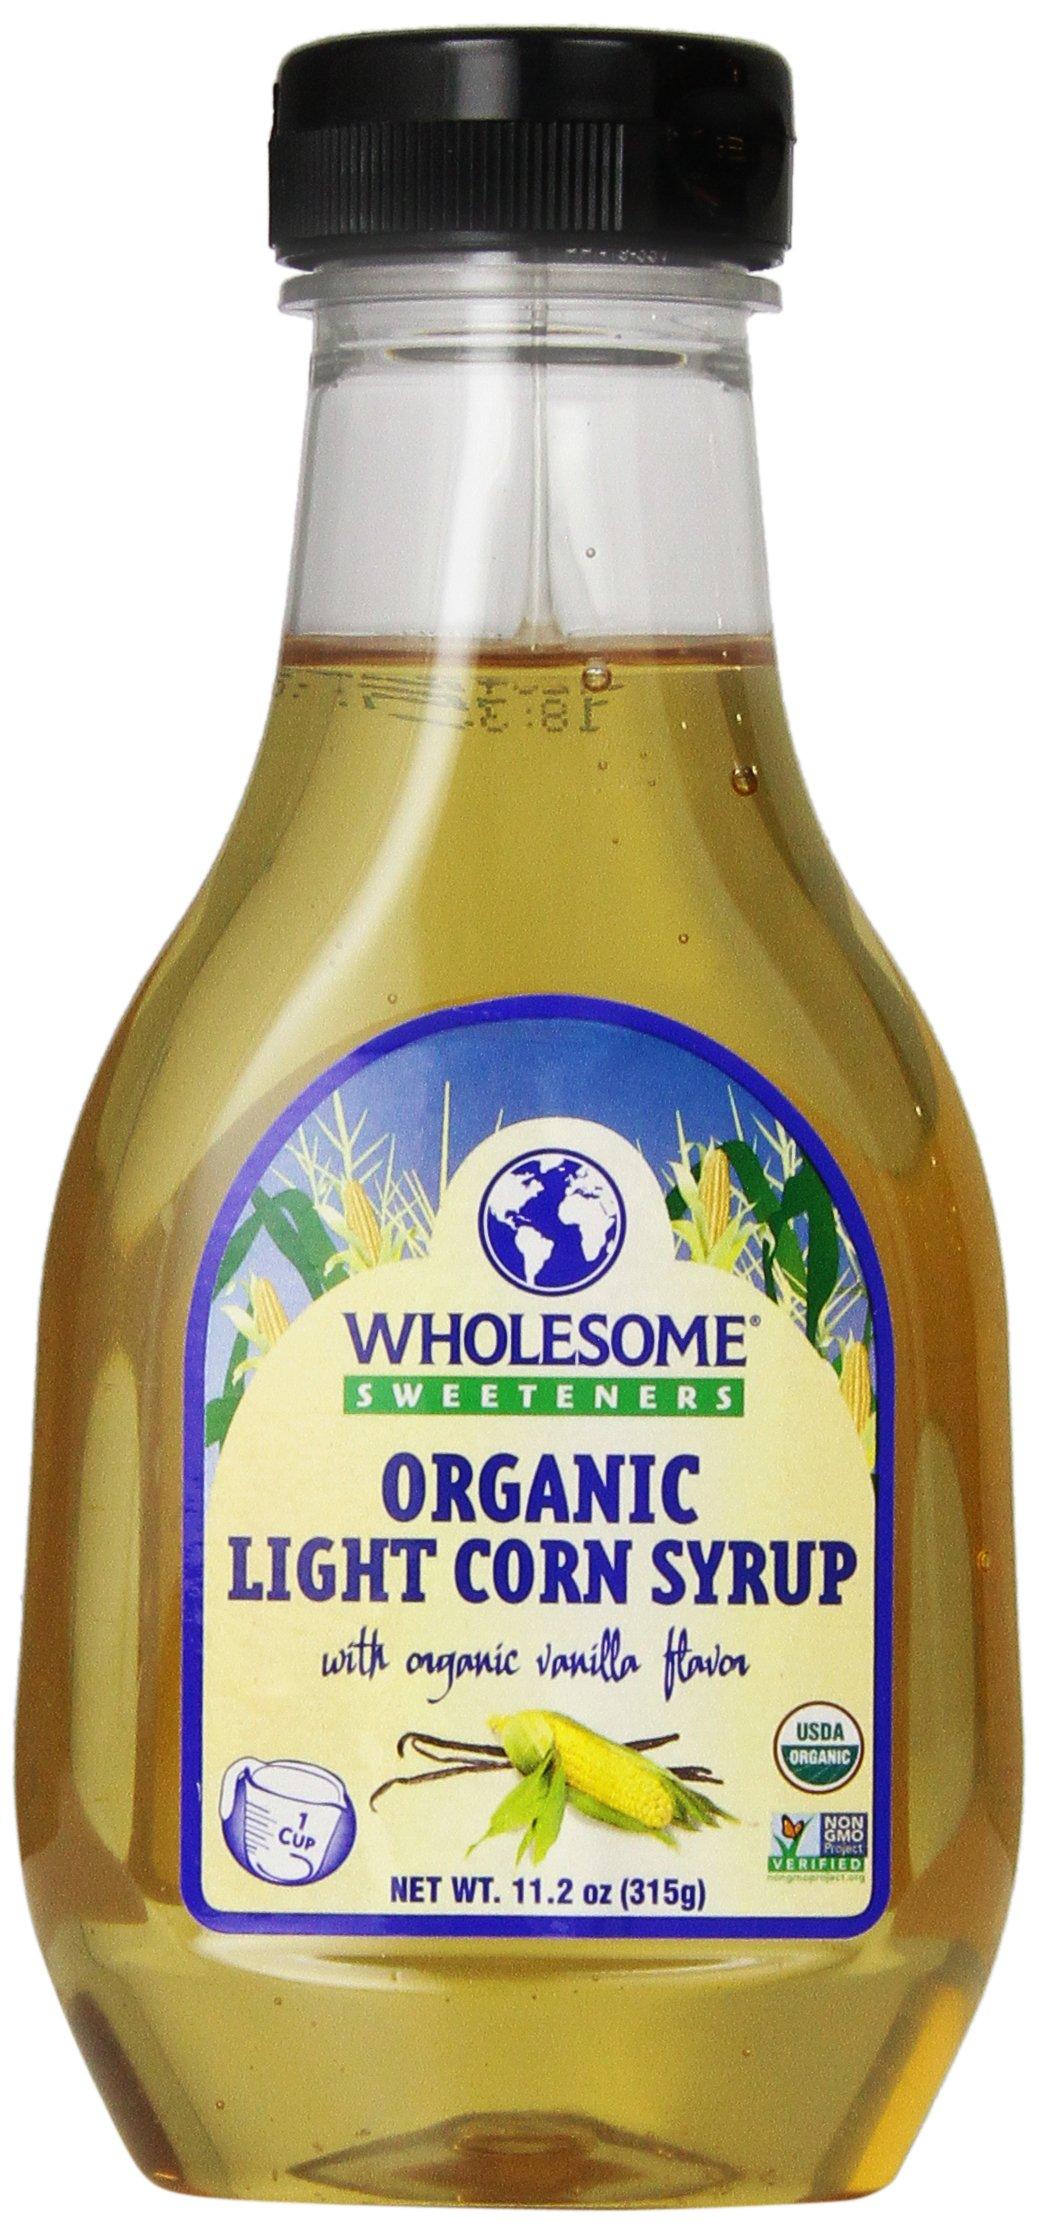 WholesWholesome Sweeteners Organic Light Corn Syrup, 11.2 oz. (Pack of 3)